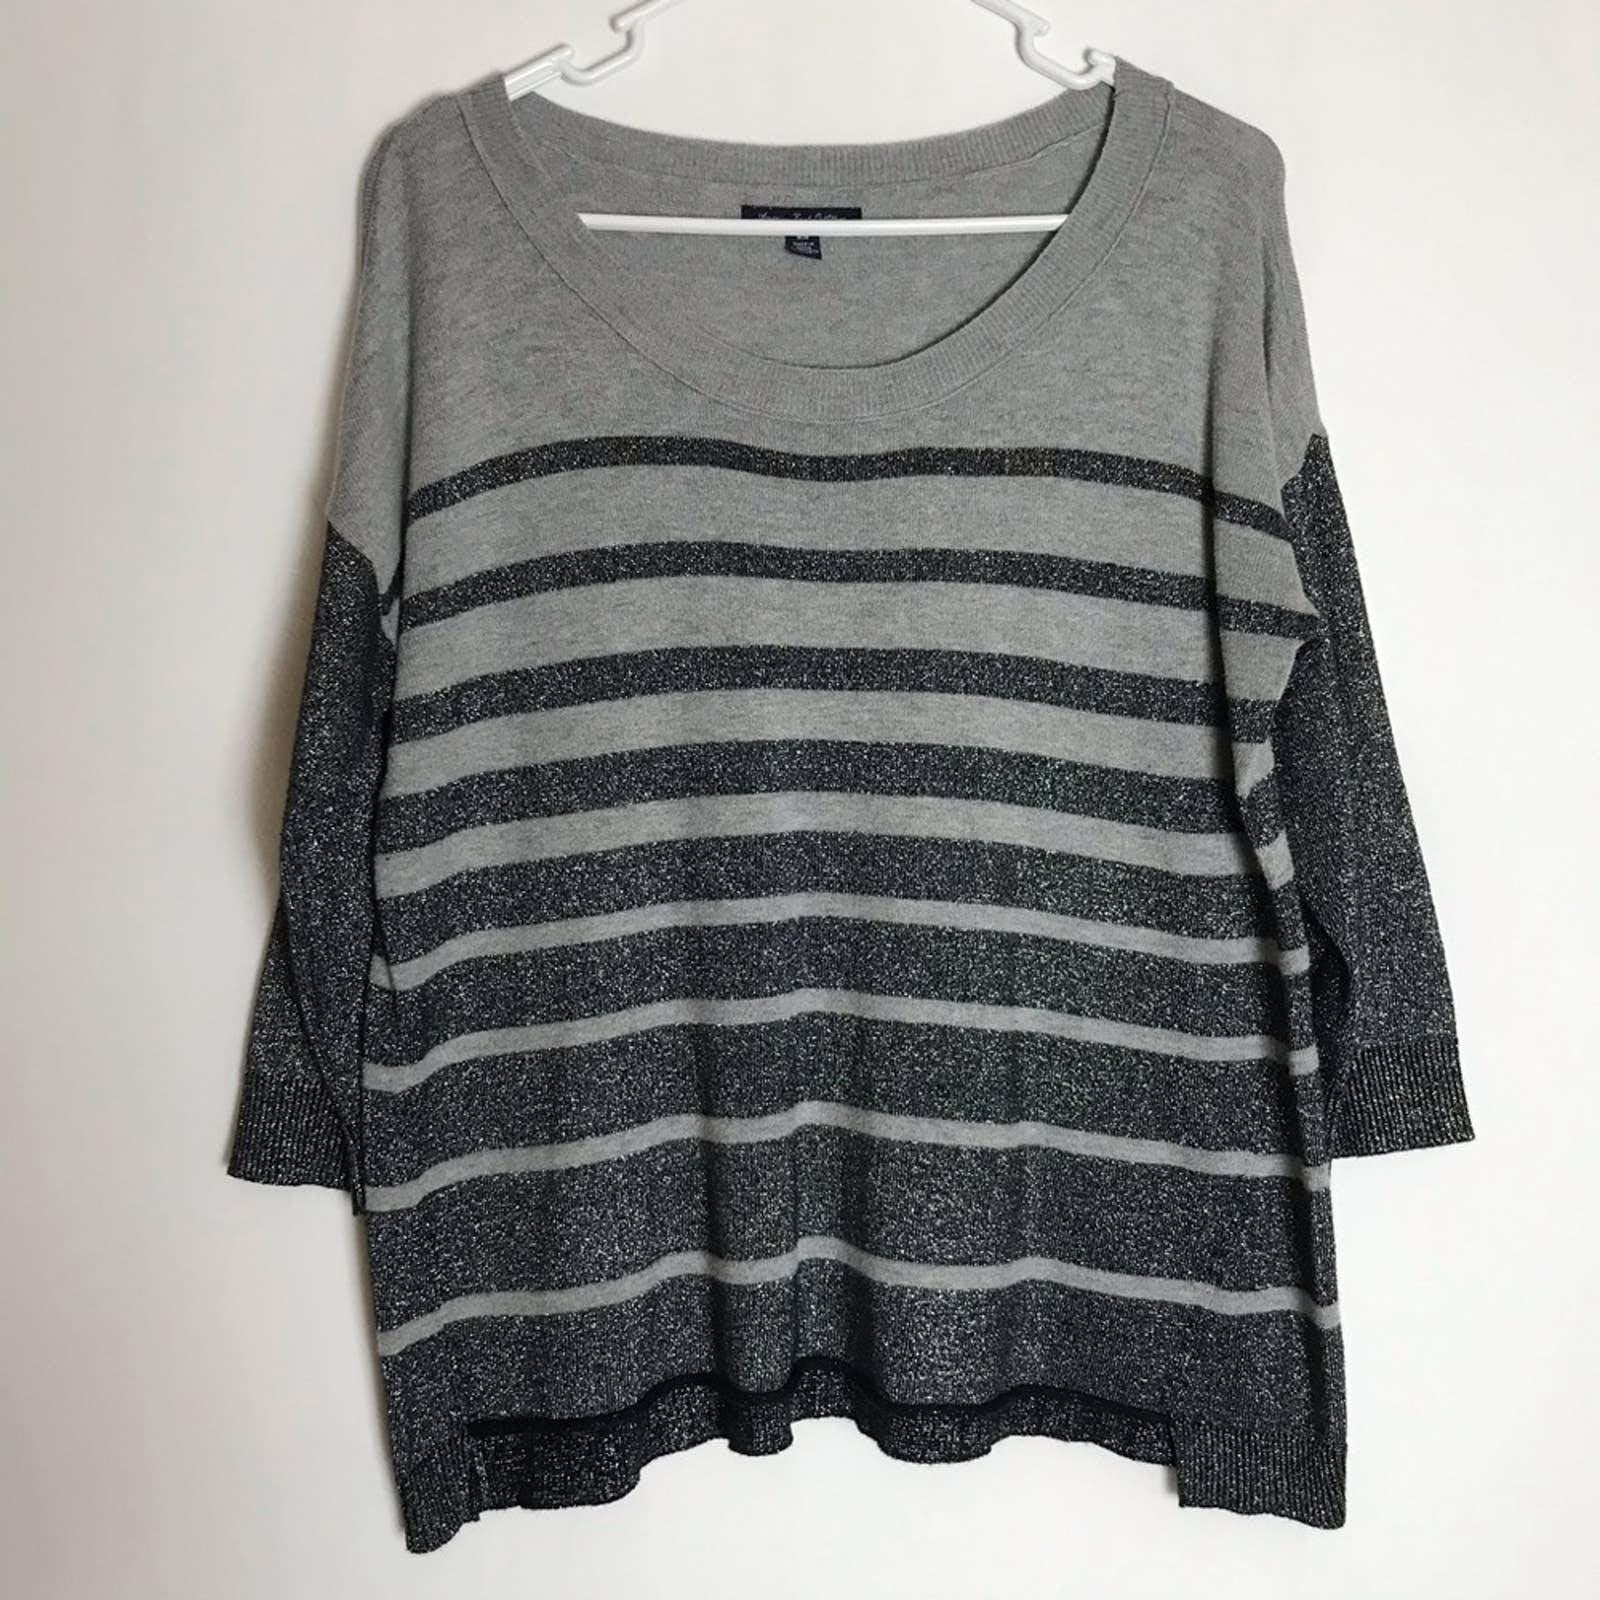 AMERICAN EAGLE Grey and Black Shirt